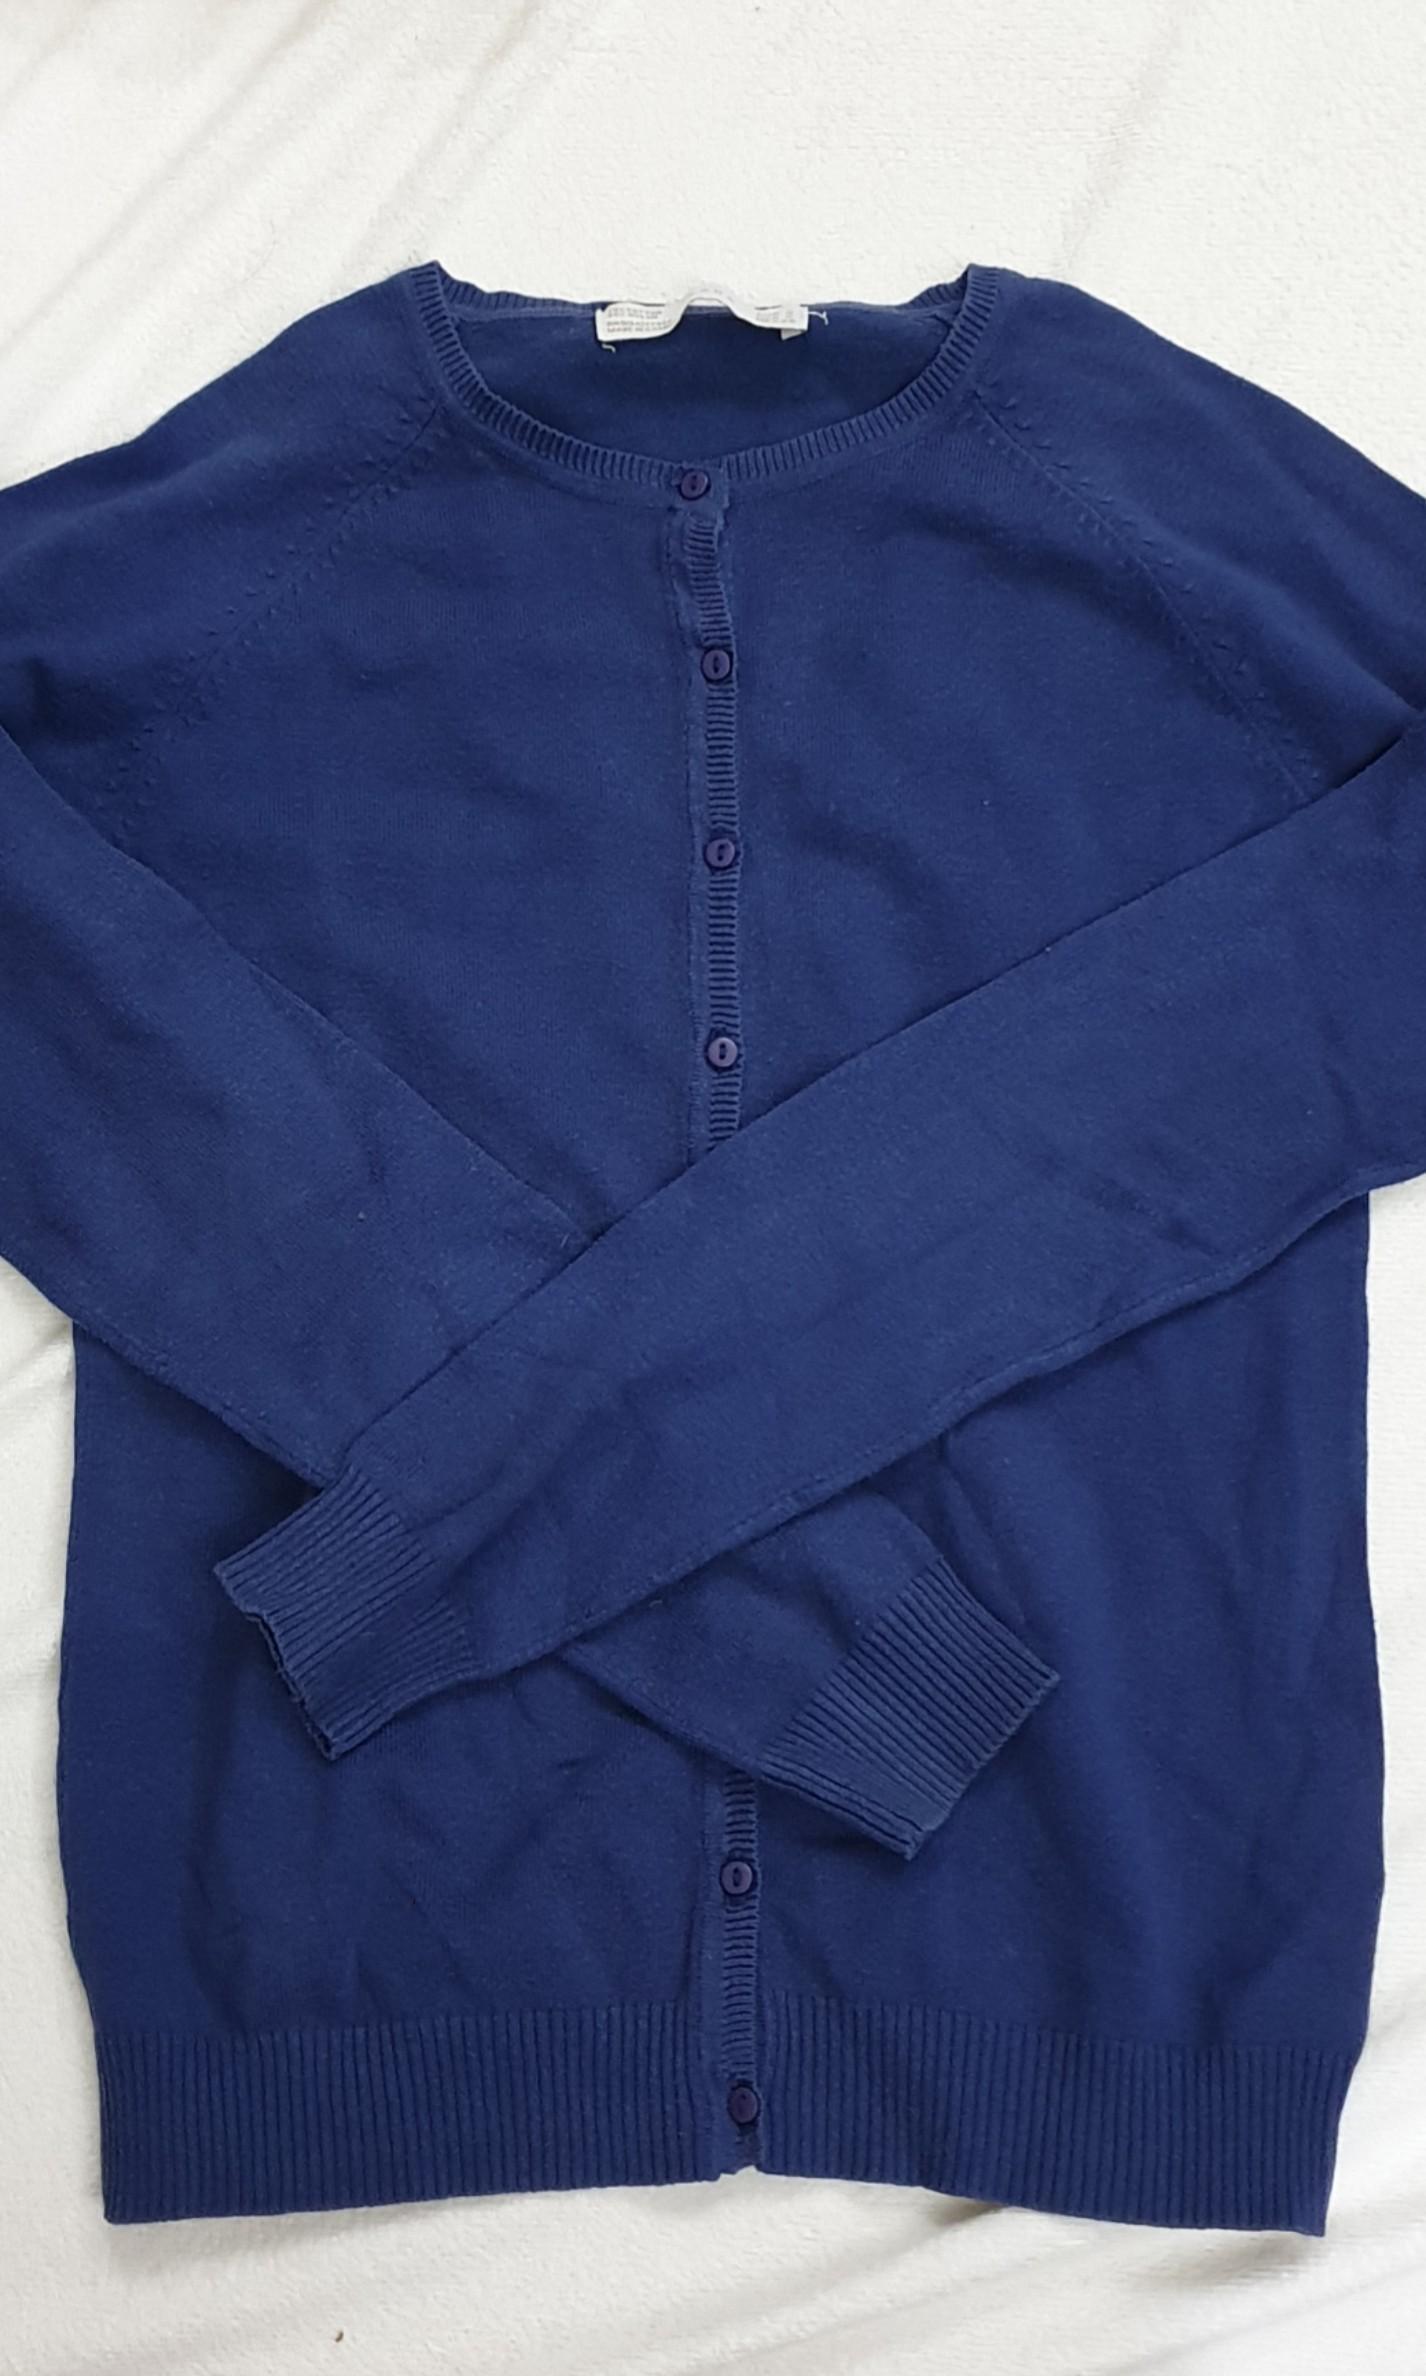 Zara blue cardigan